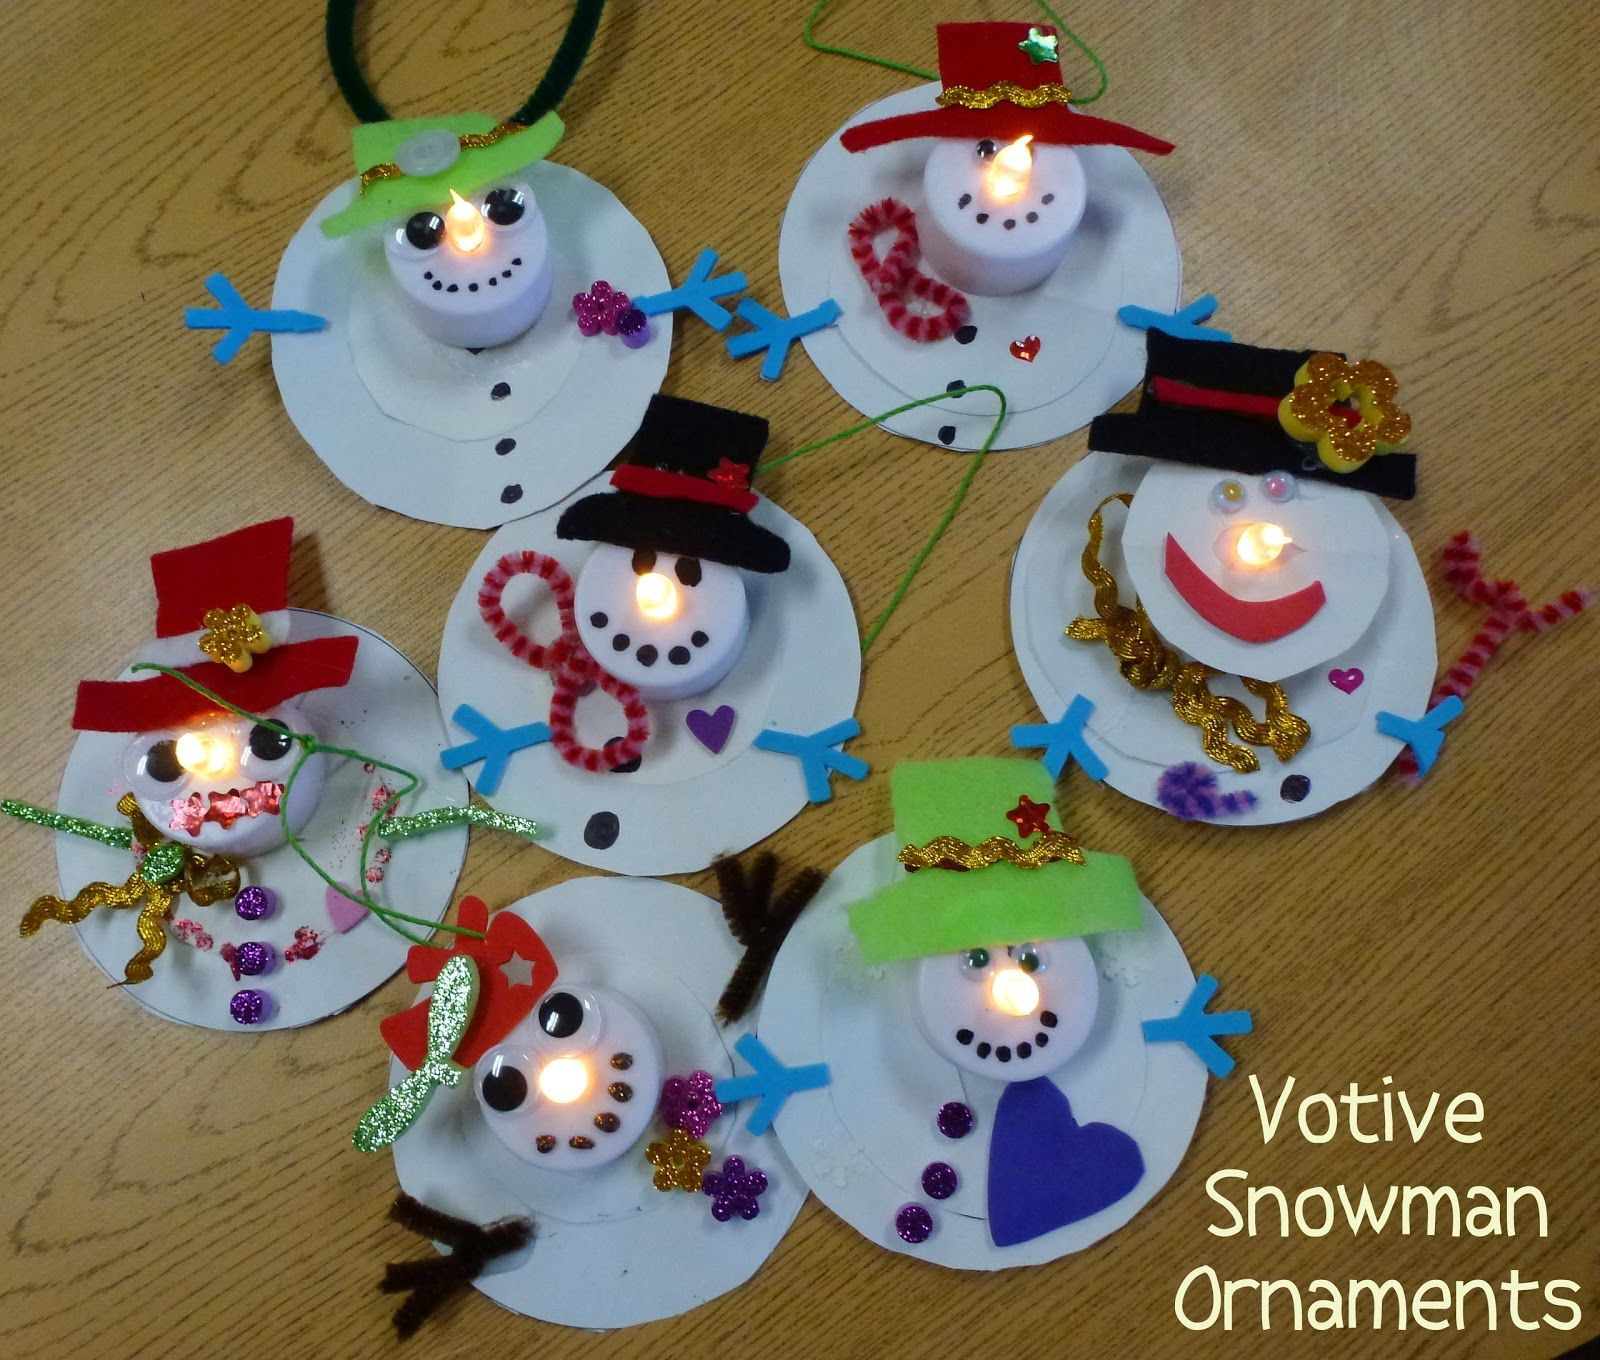 winterdeko basteln | Choices for Children: Votive Snowman Ornaments #snowmancrafts